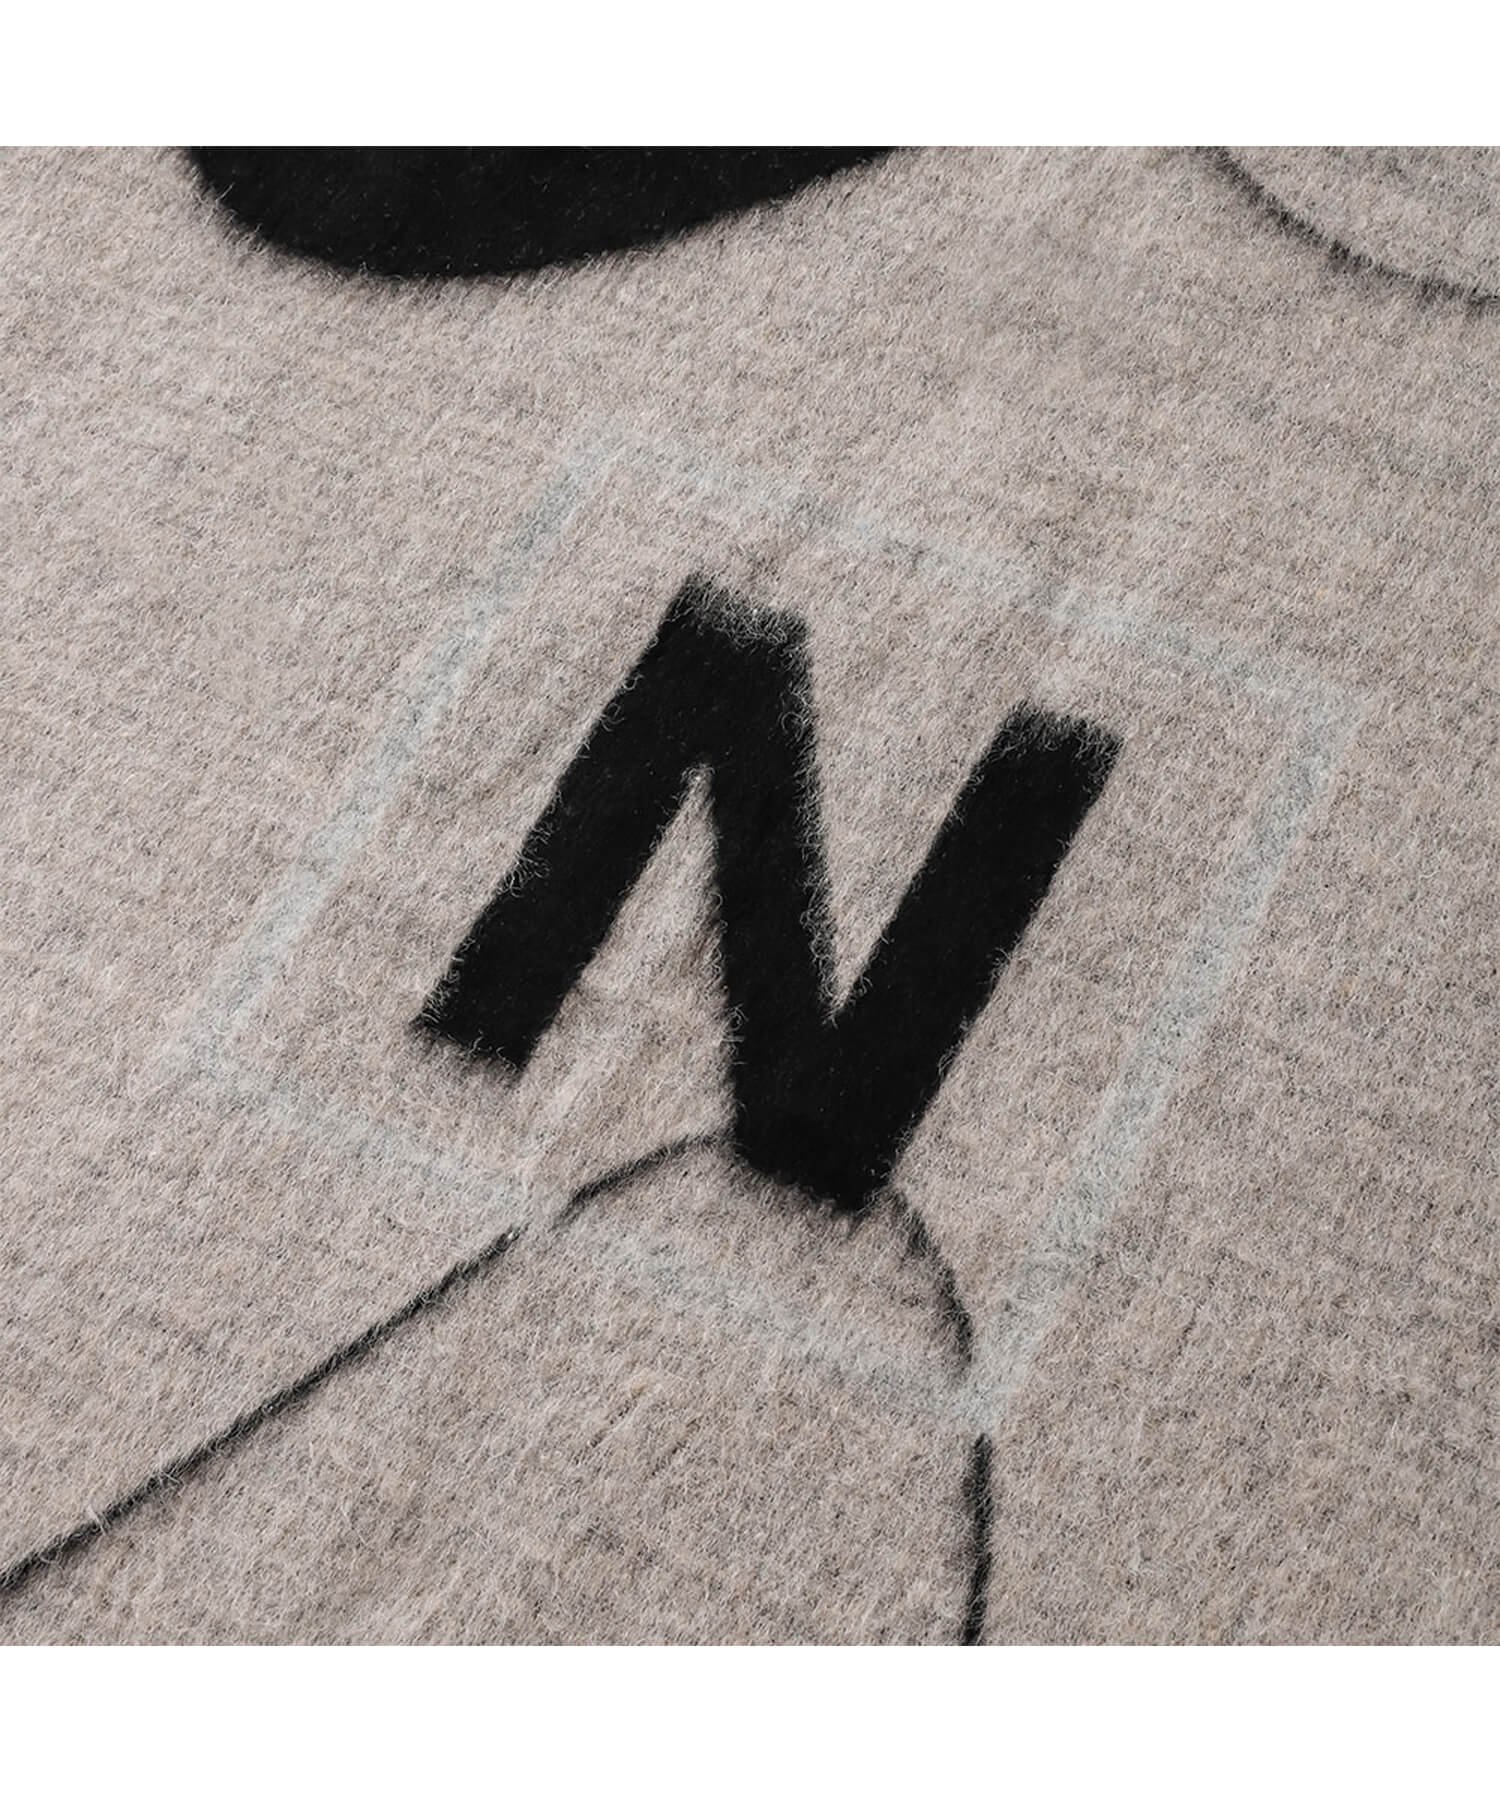 NIL DUE / NIL UN TOKYO / ニル デュエ / ニル アン トーキョー | NDNU ABSTRACT ART BLANKET (BLACK) 商品画像1